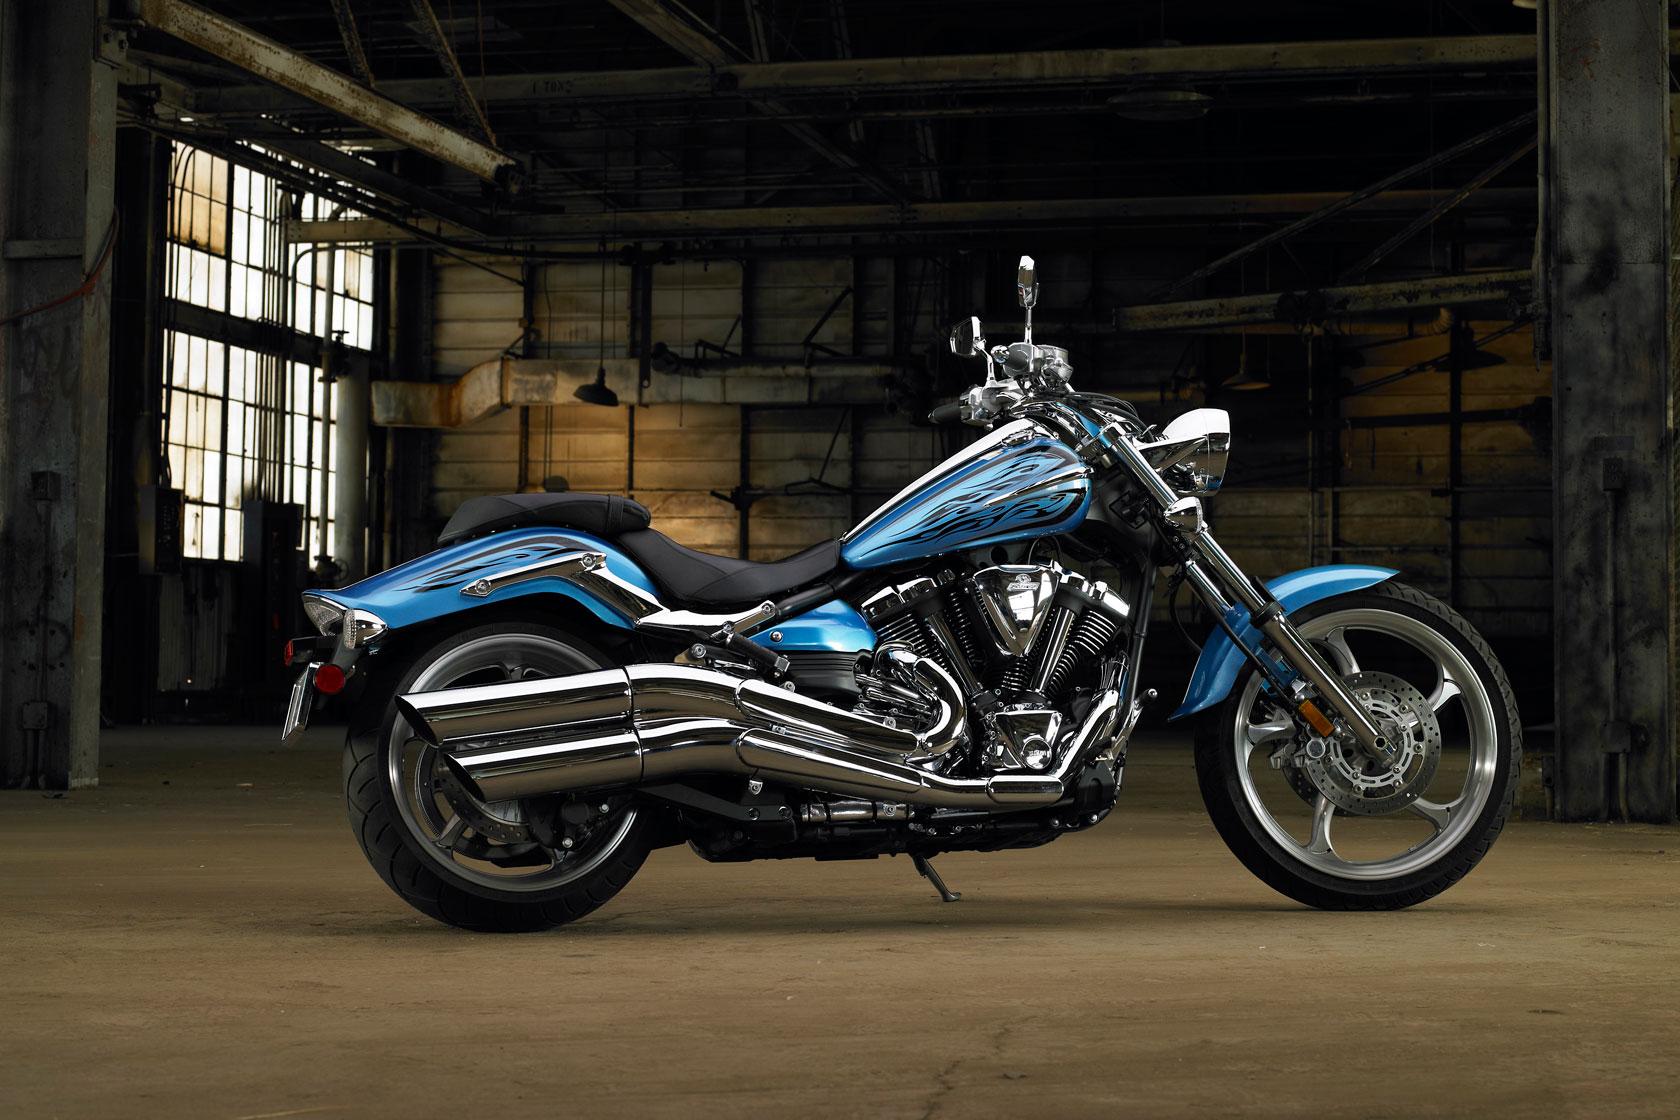 Yamaha Raider Motorcycle For Sale